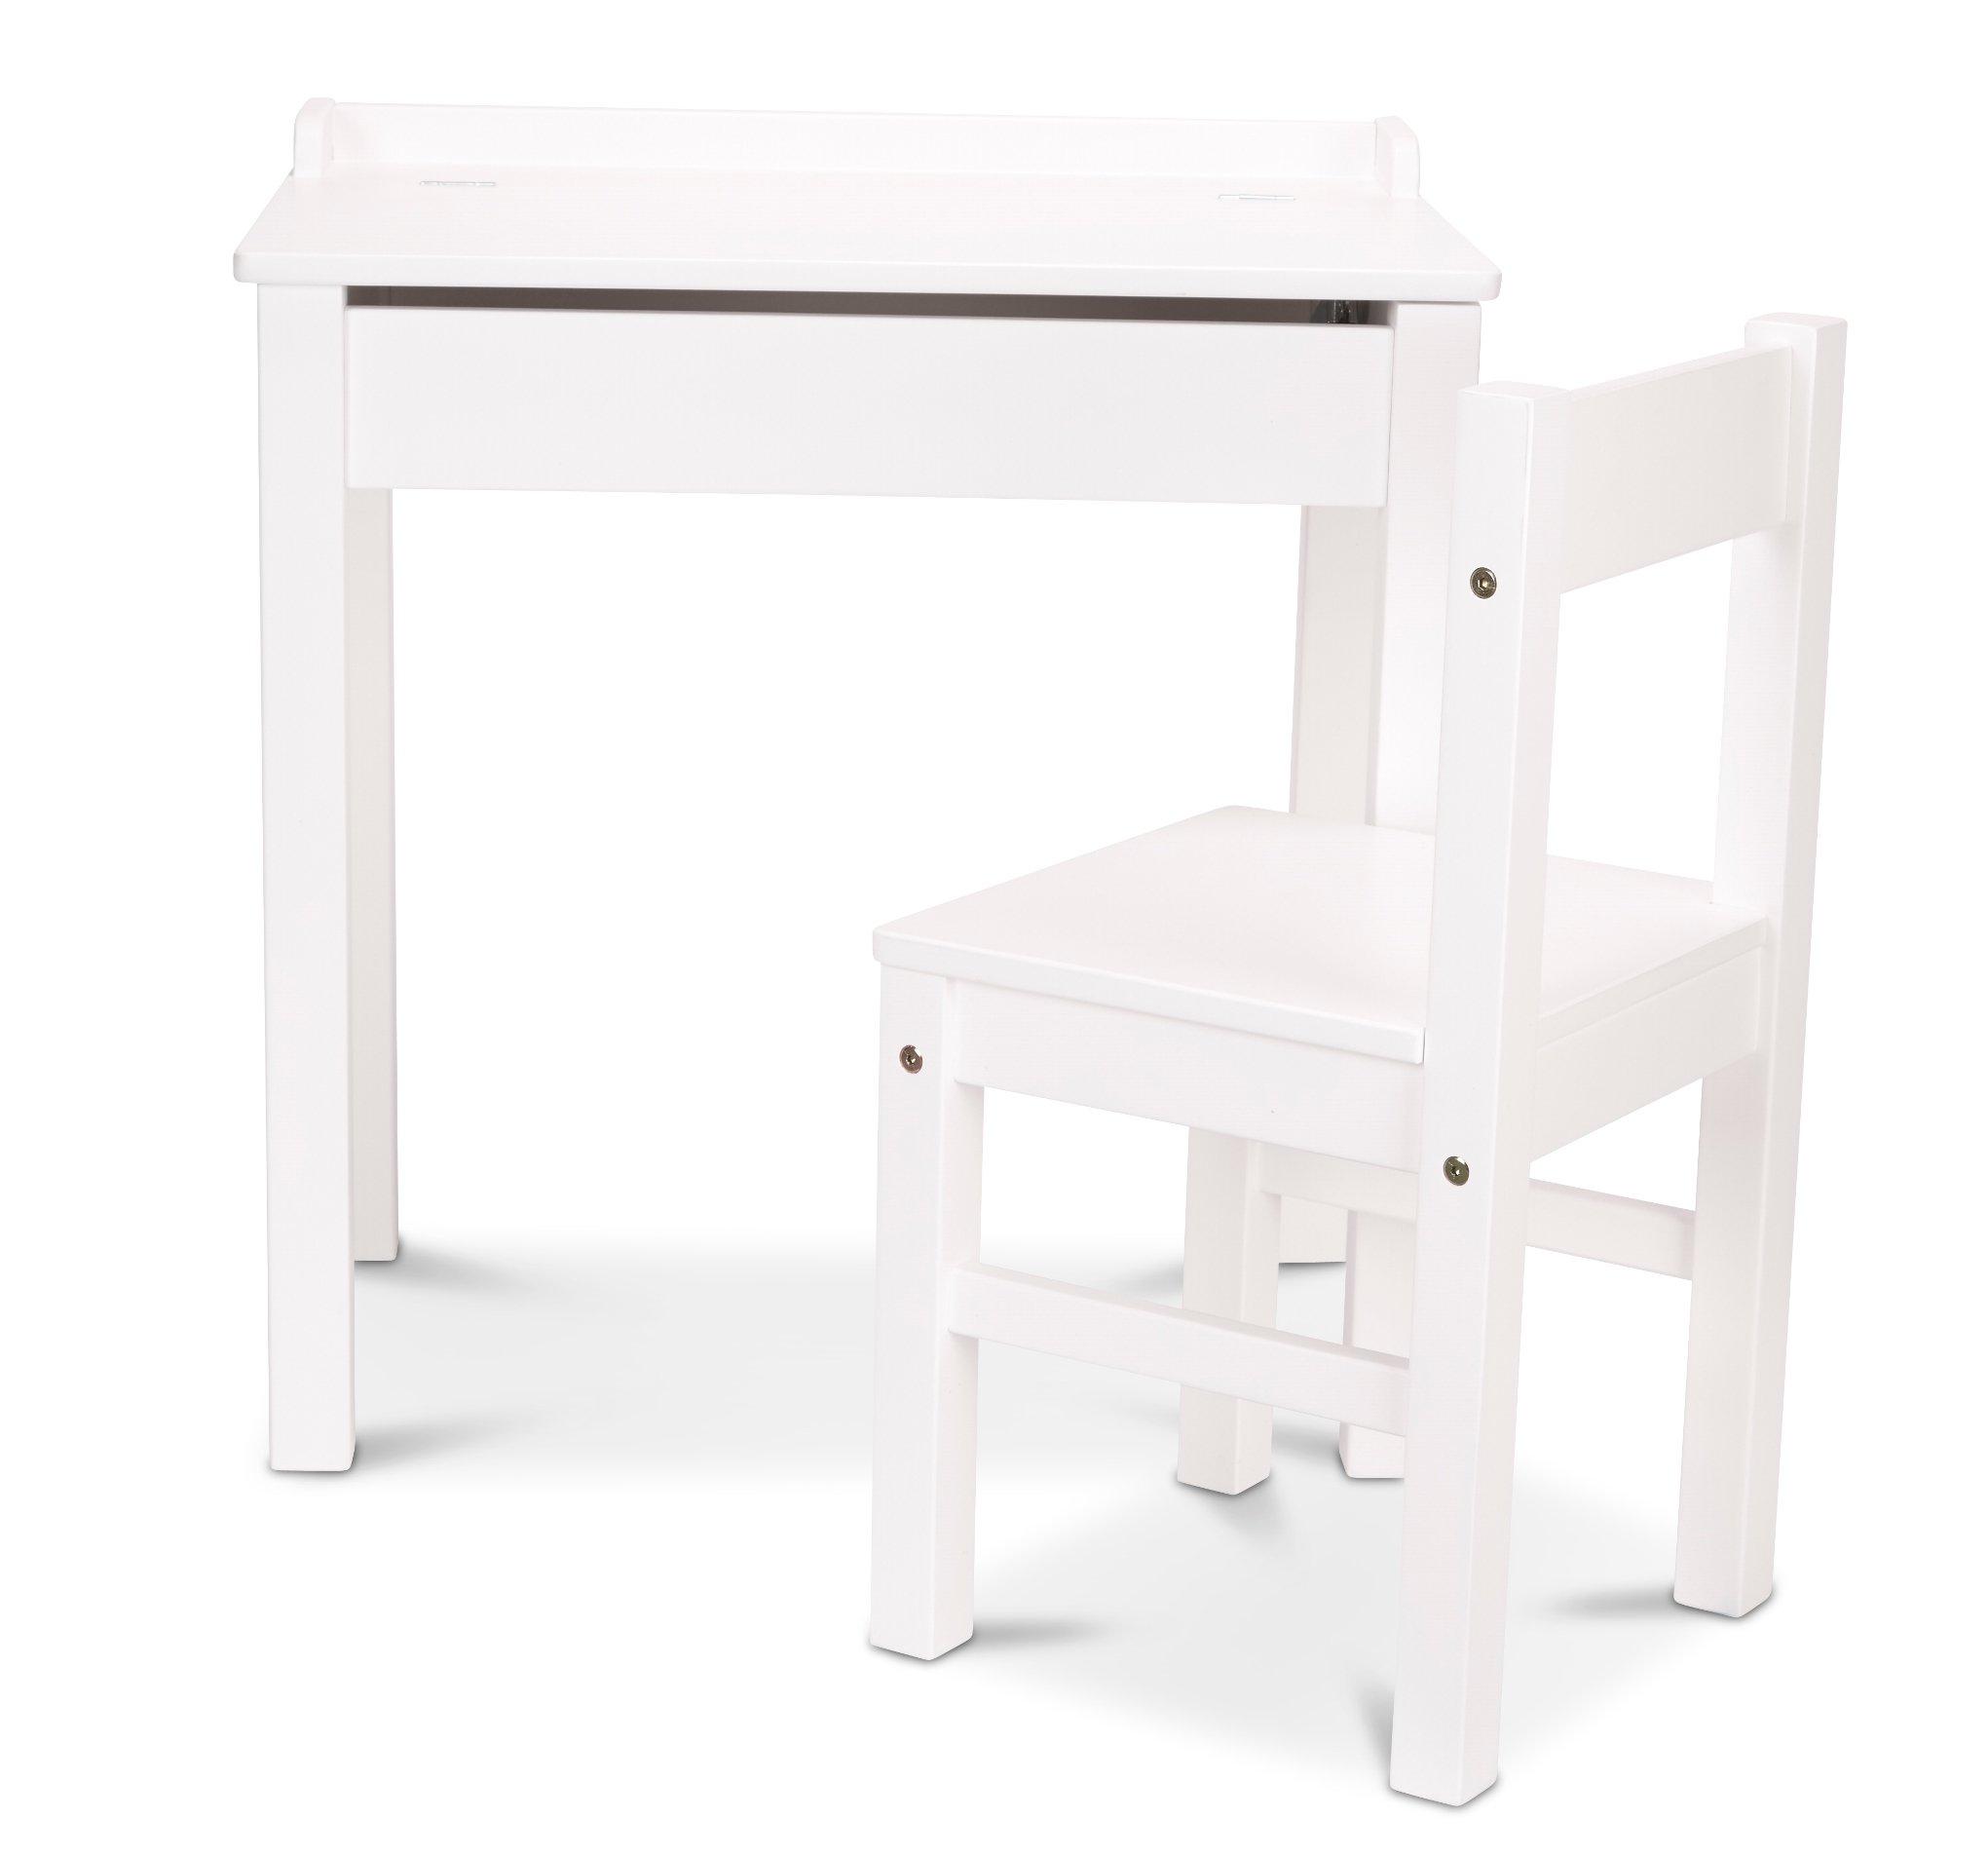 Melissa & Doug Desk & Chair - White Children's Furniture by Melissa & Doug